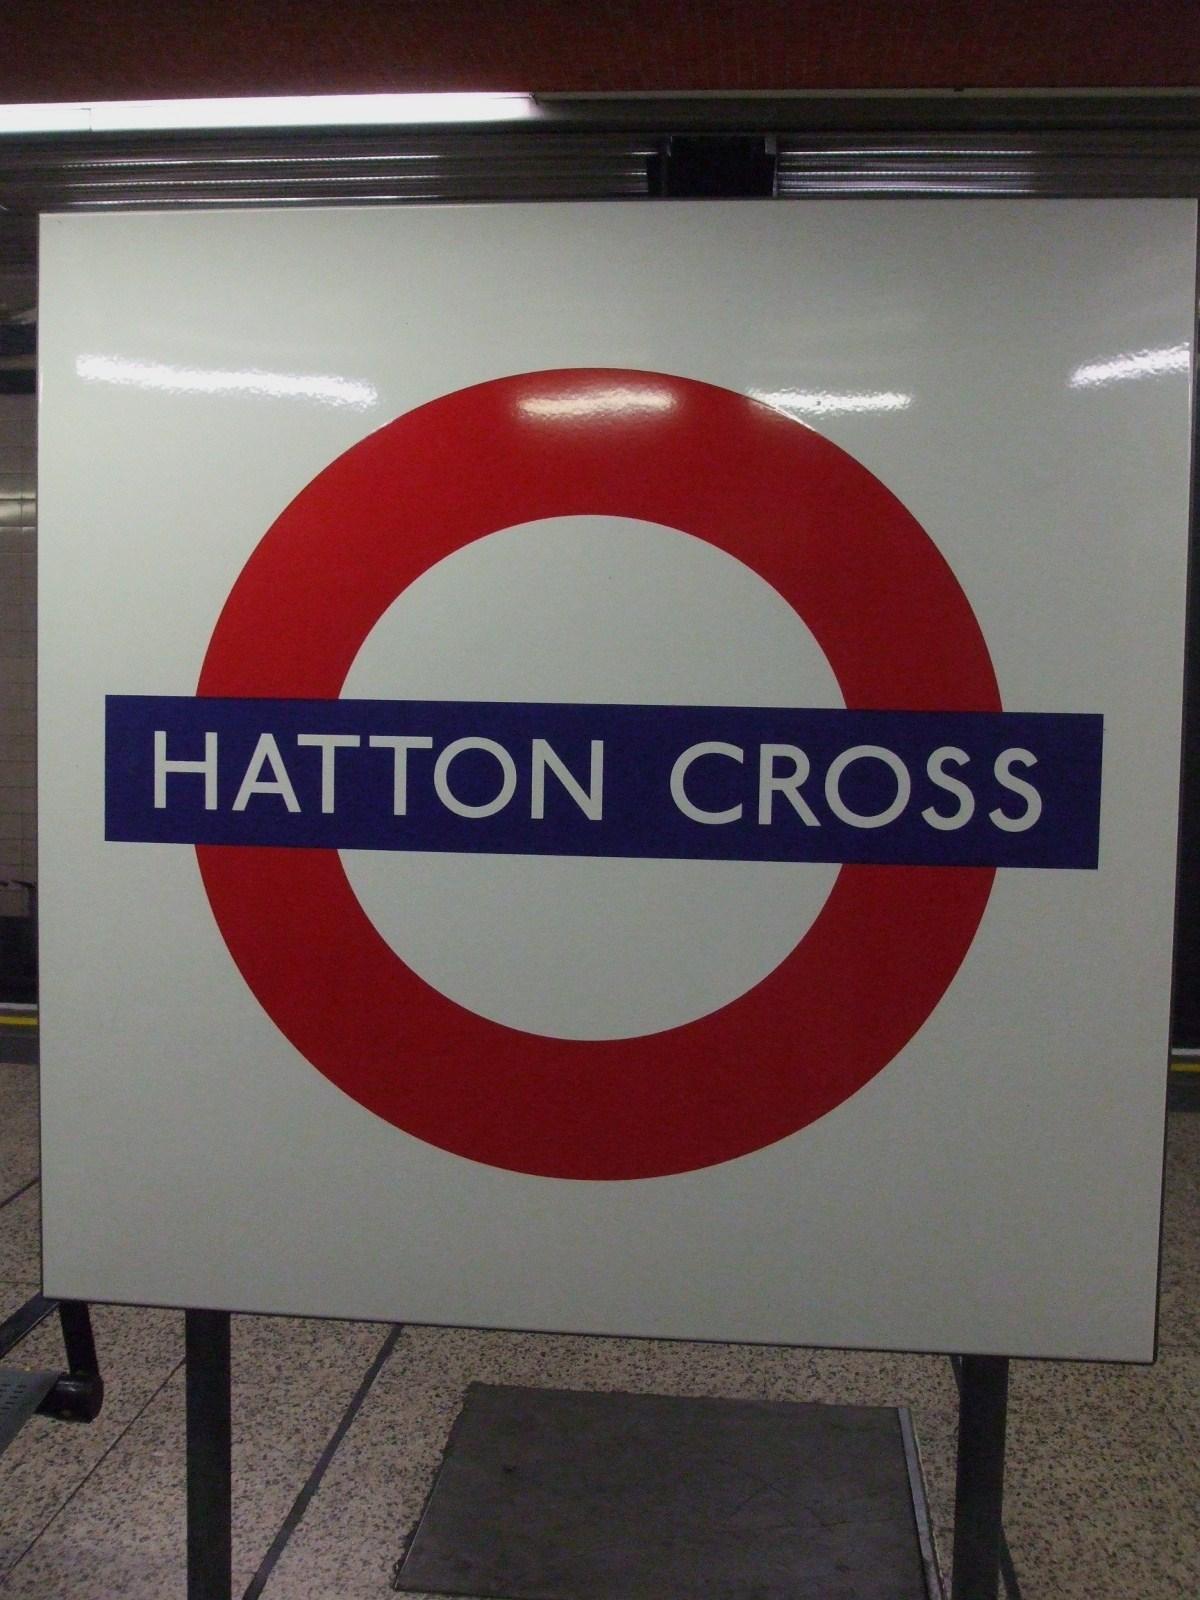 Hatton Cross Tube Station London